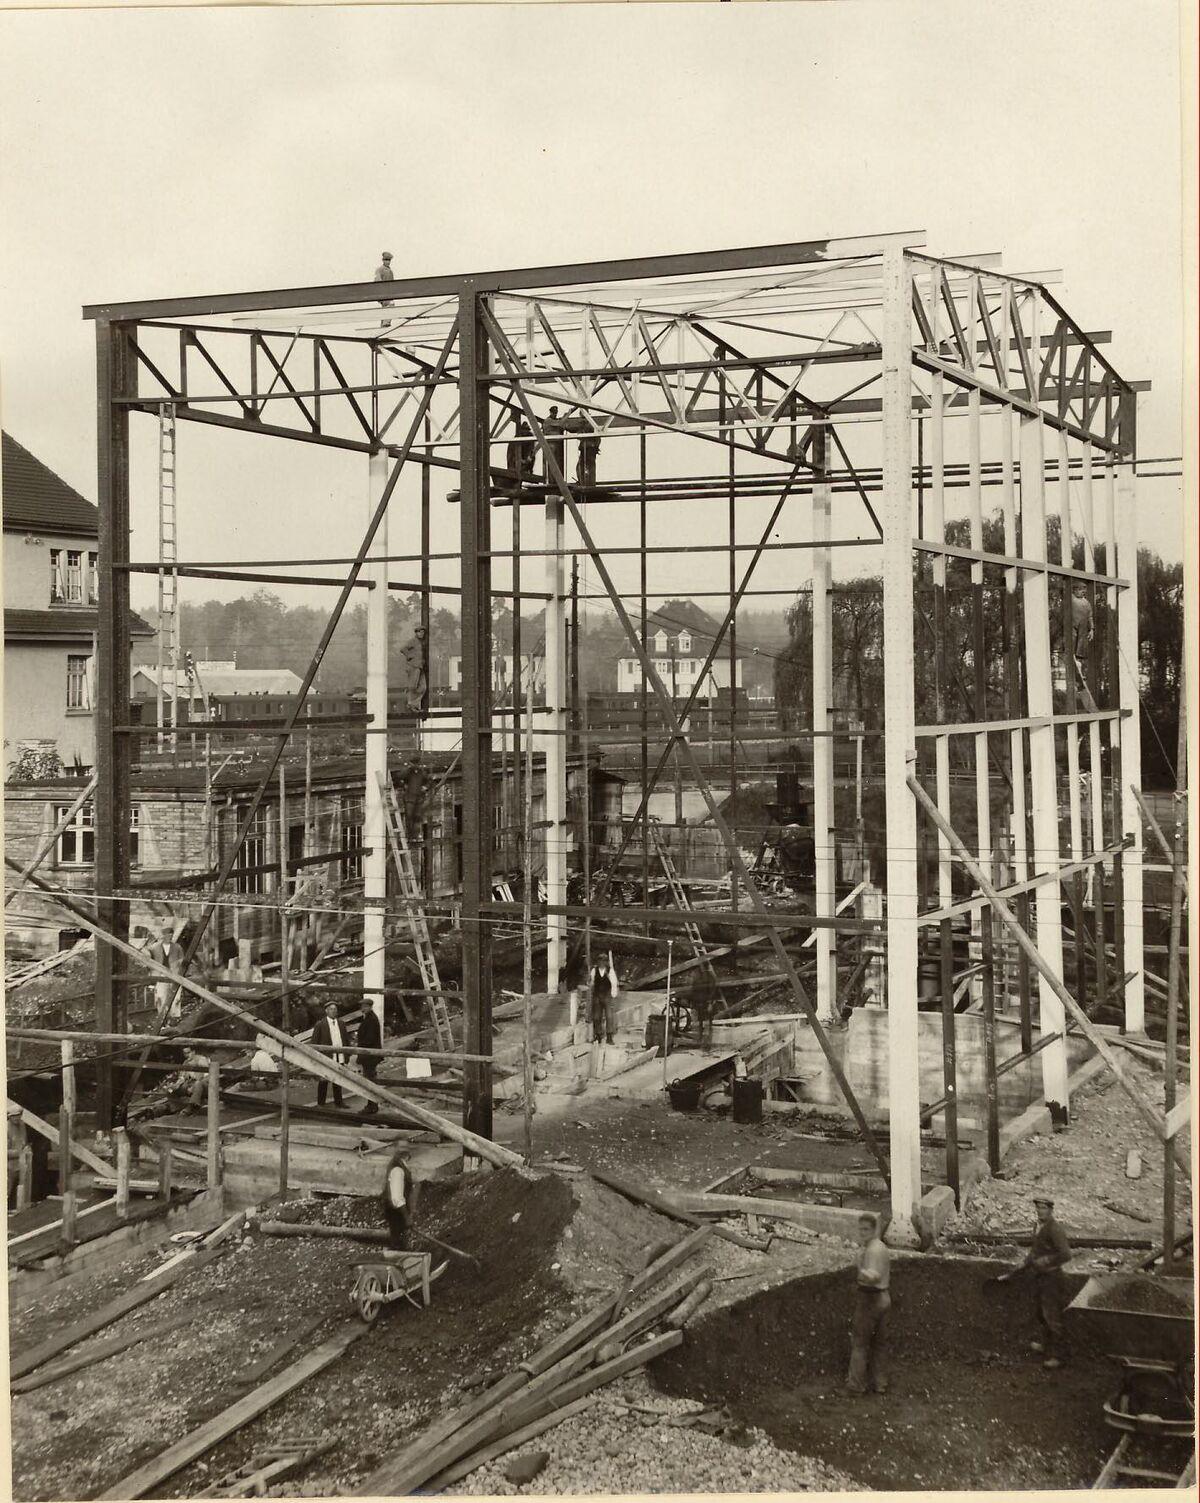 GFA 24/53.1157: New broiler house